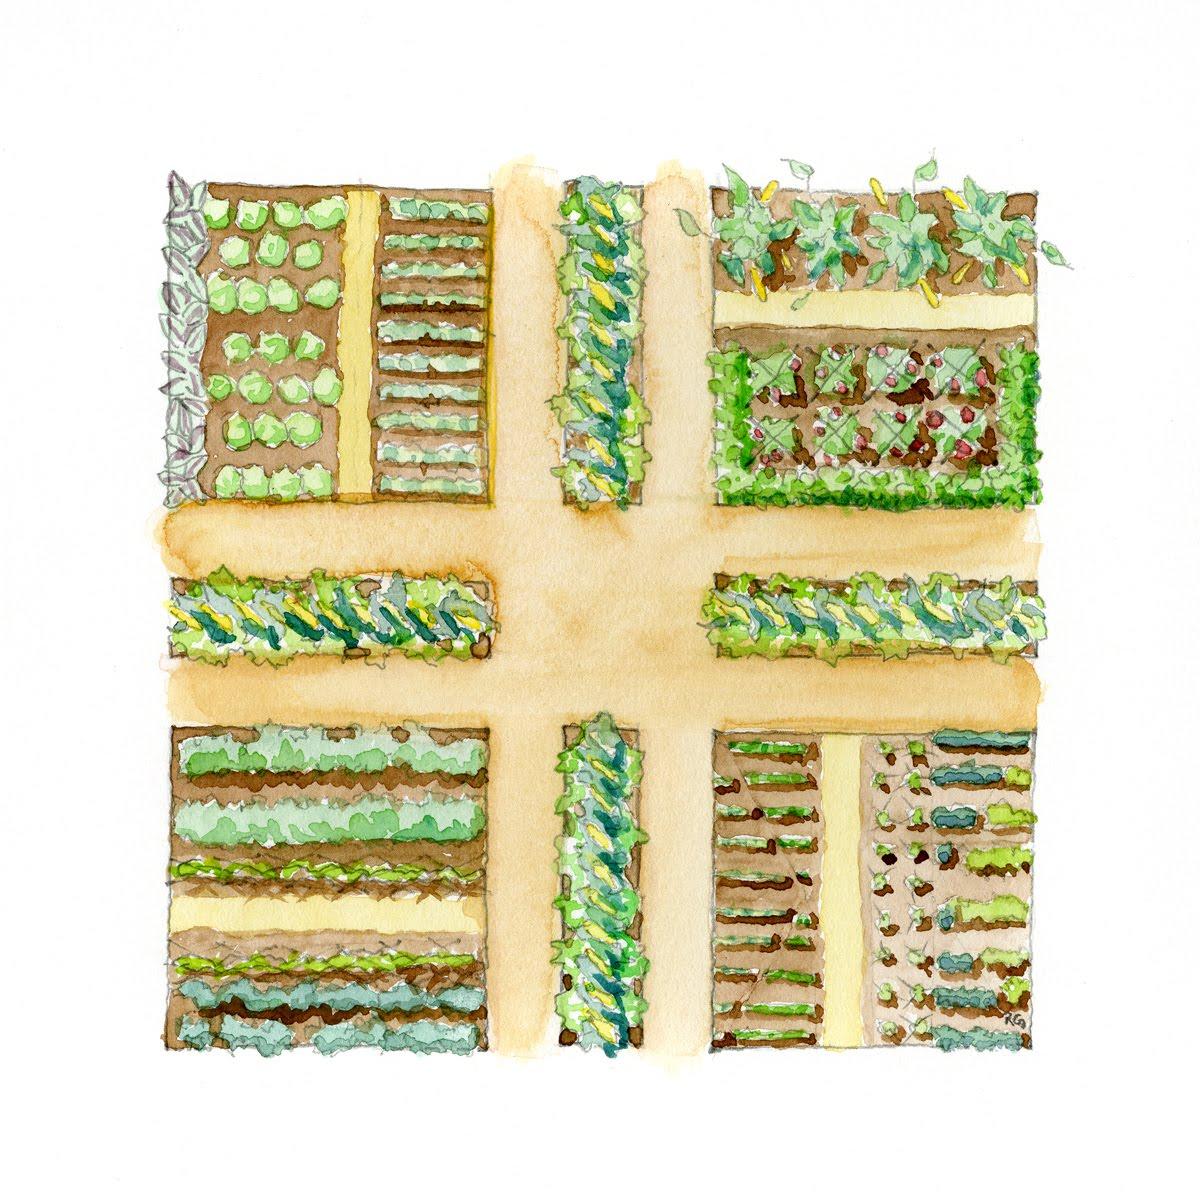 soil before seeds